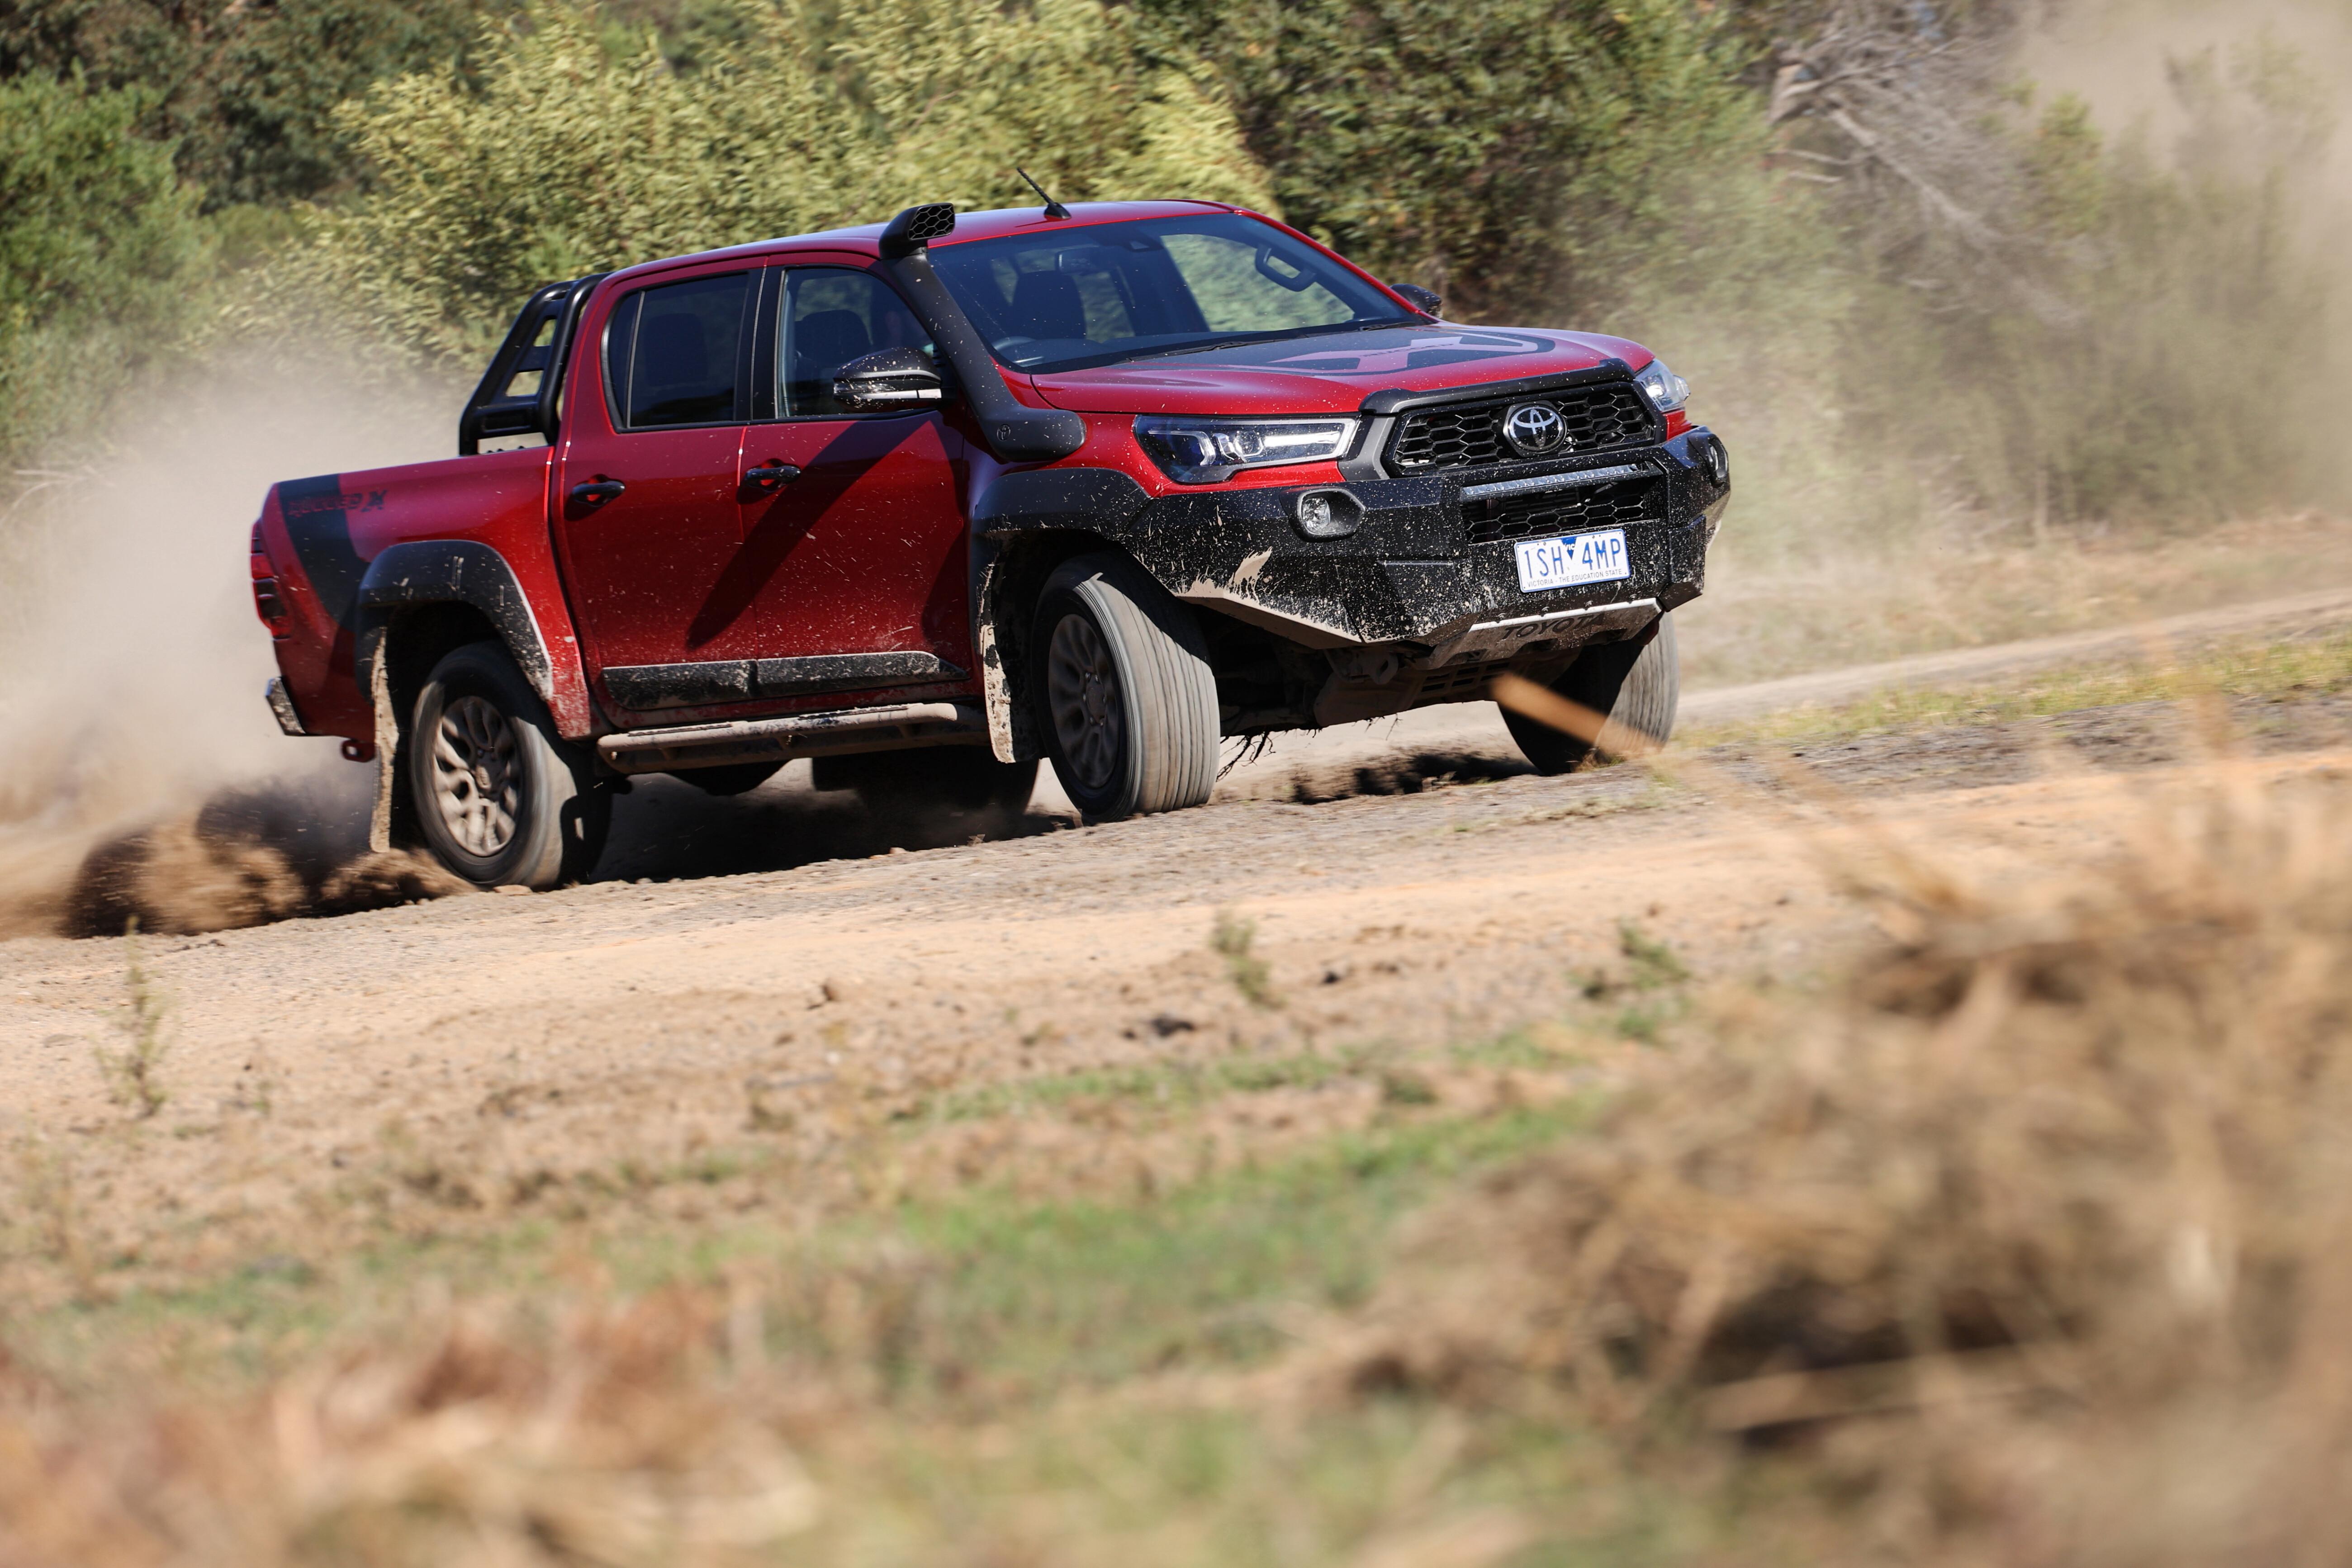 4 X 4 Australia Comparisons 2021 May 21 Toyota Hilux Rugged X Dirt Driving